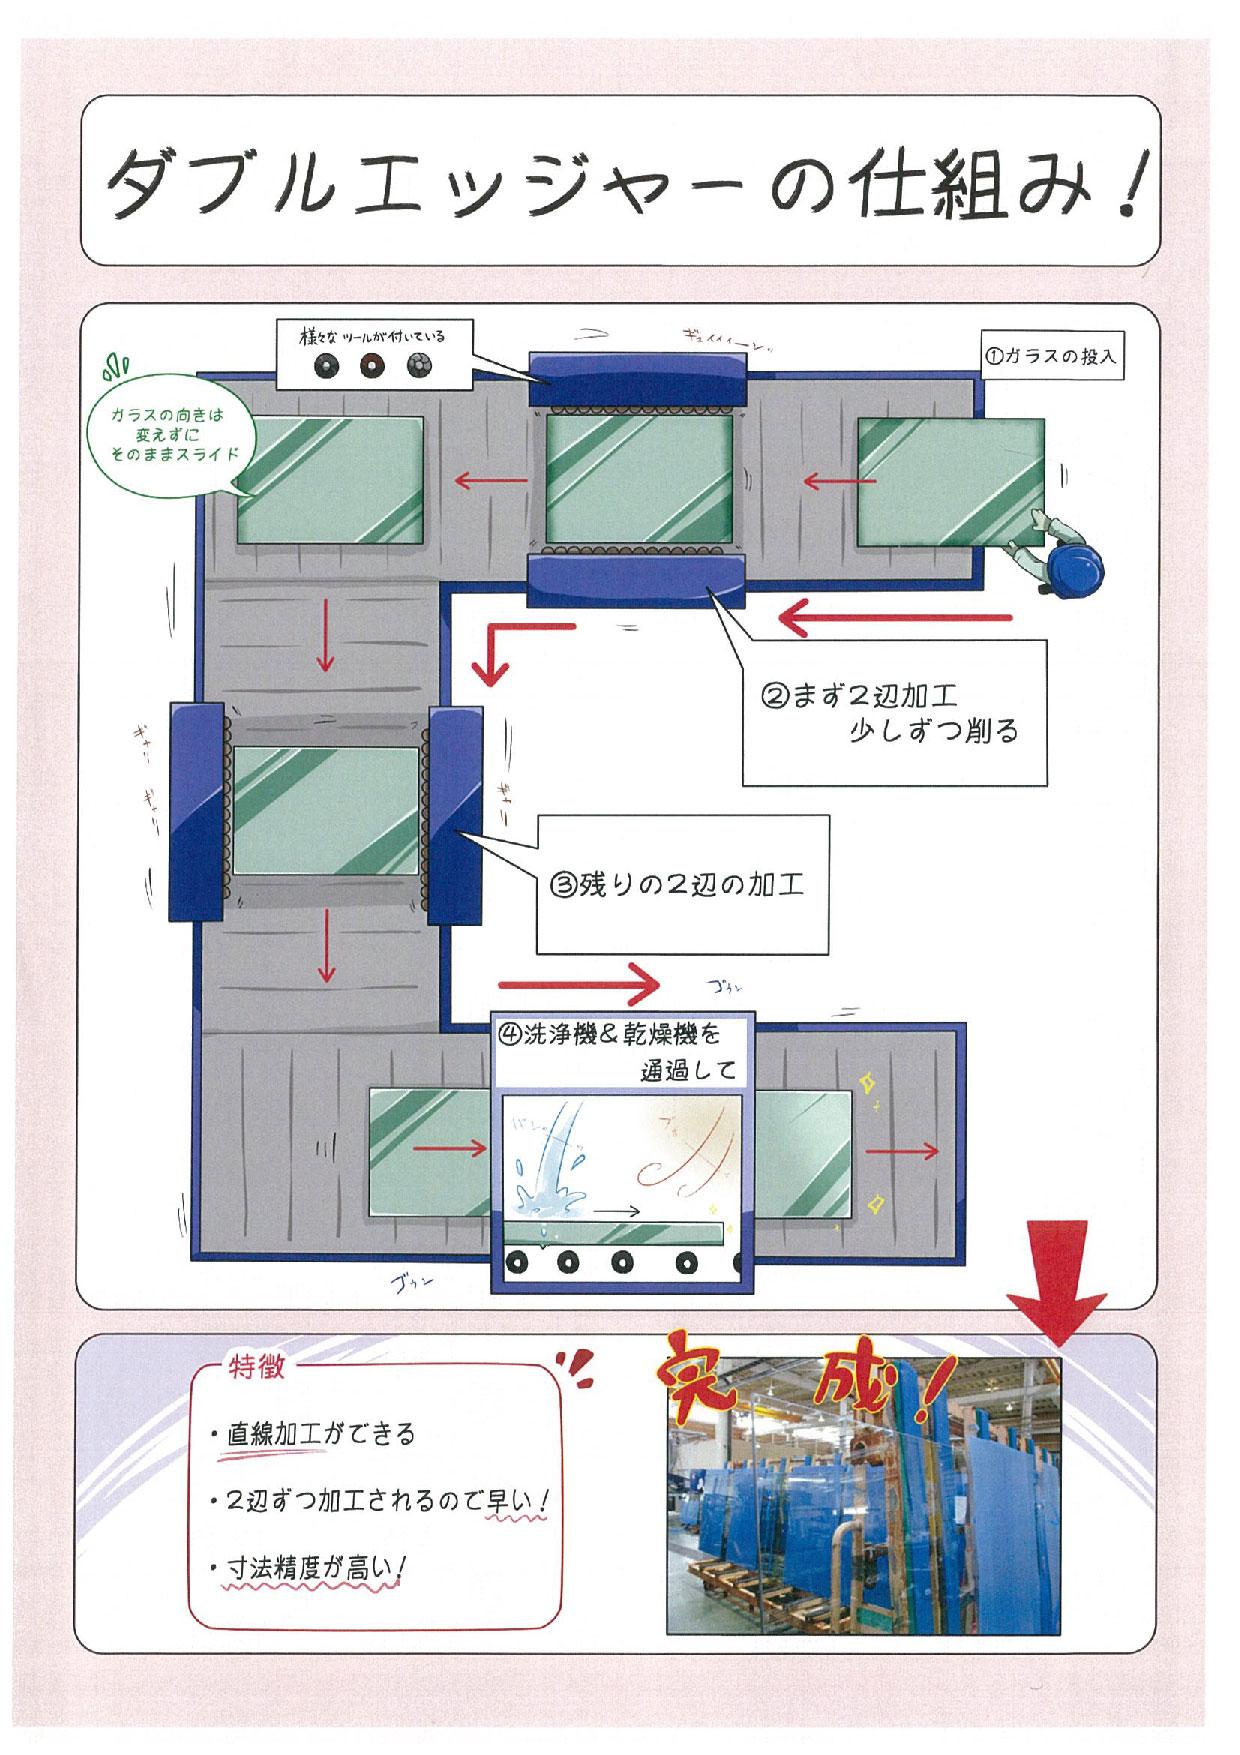 https://www.sanshiba-g.co.jp/images/setubi/DE.jpg